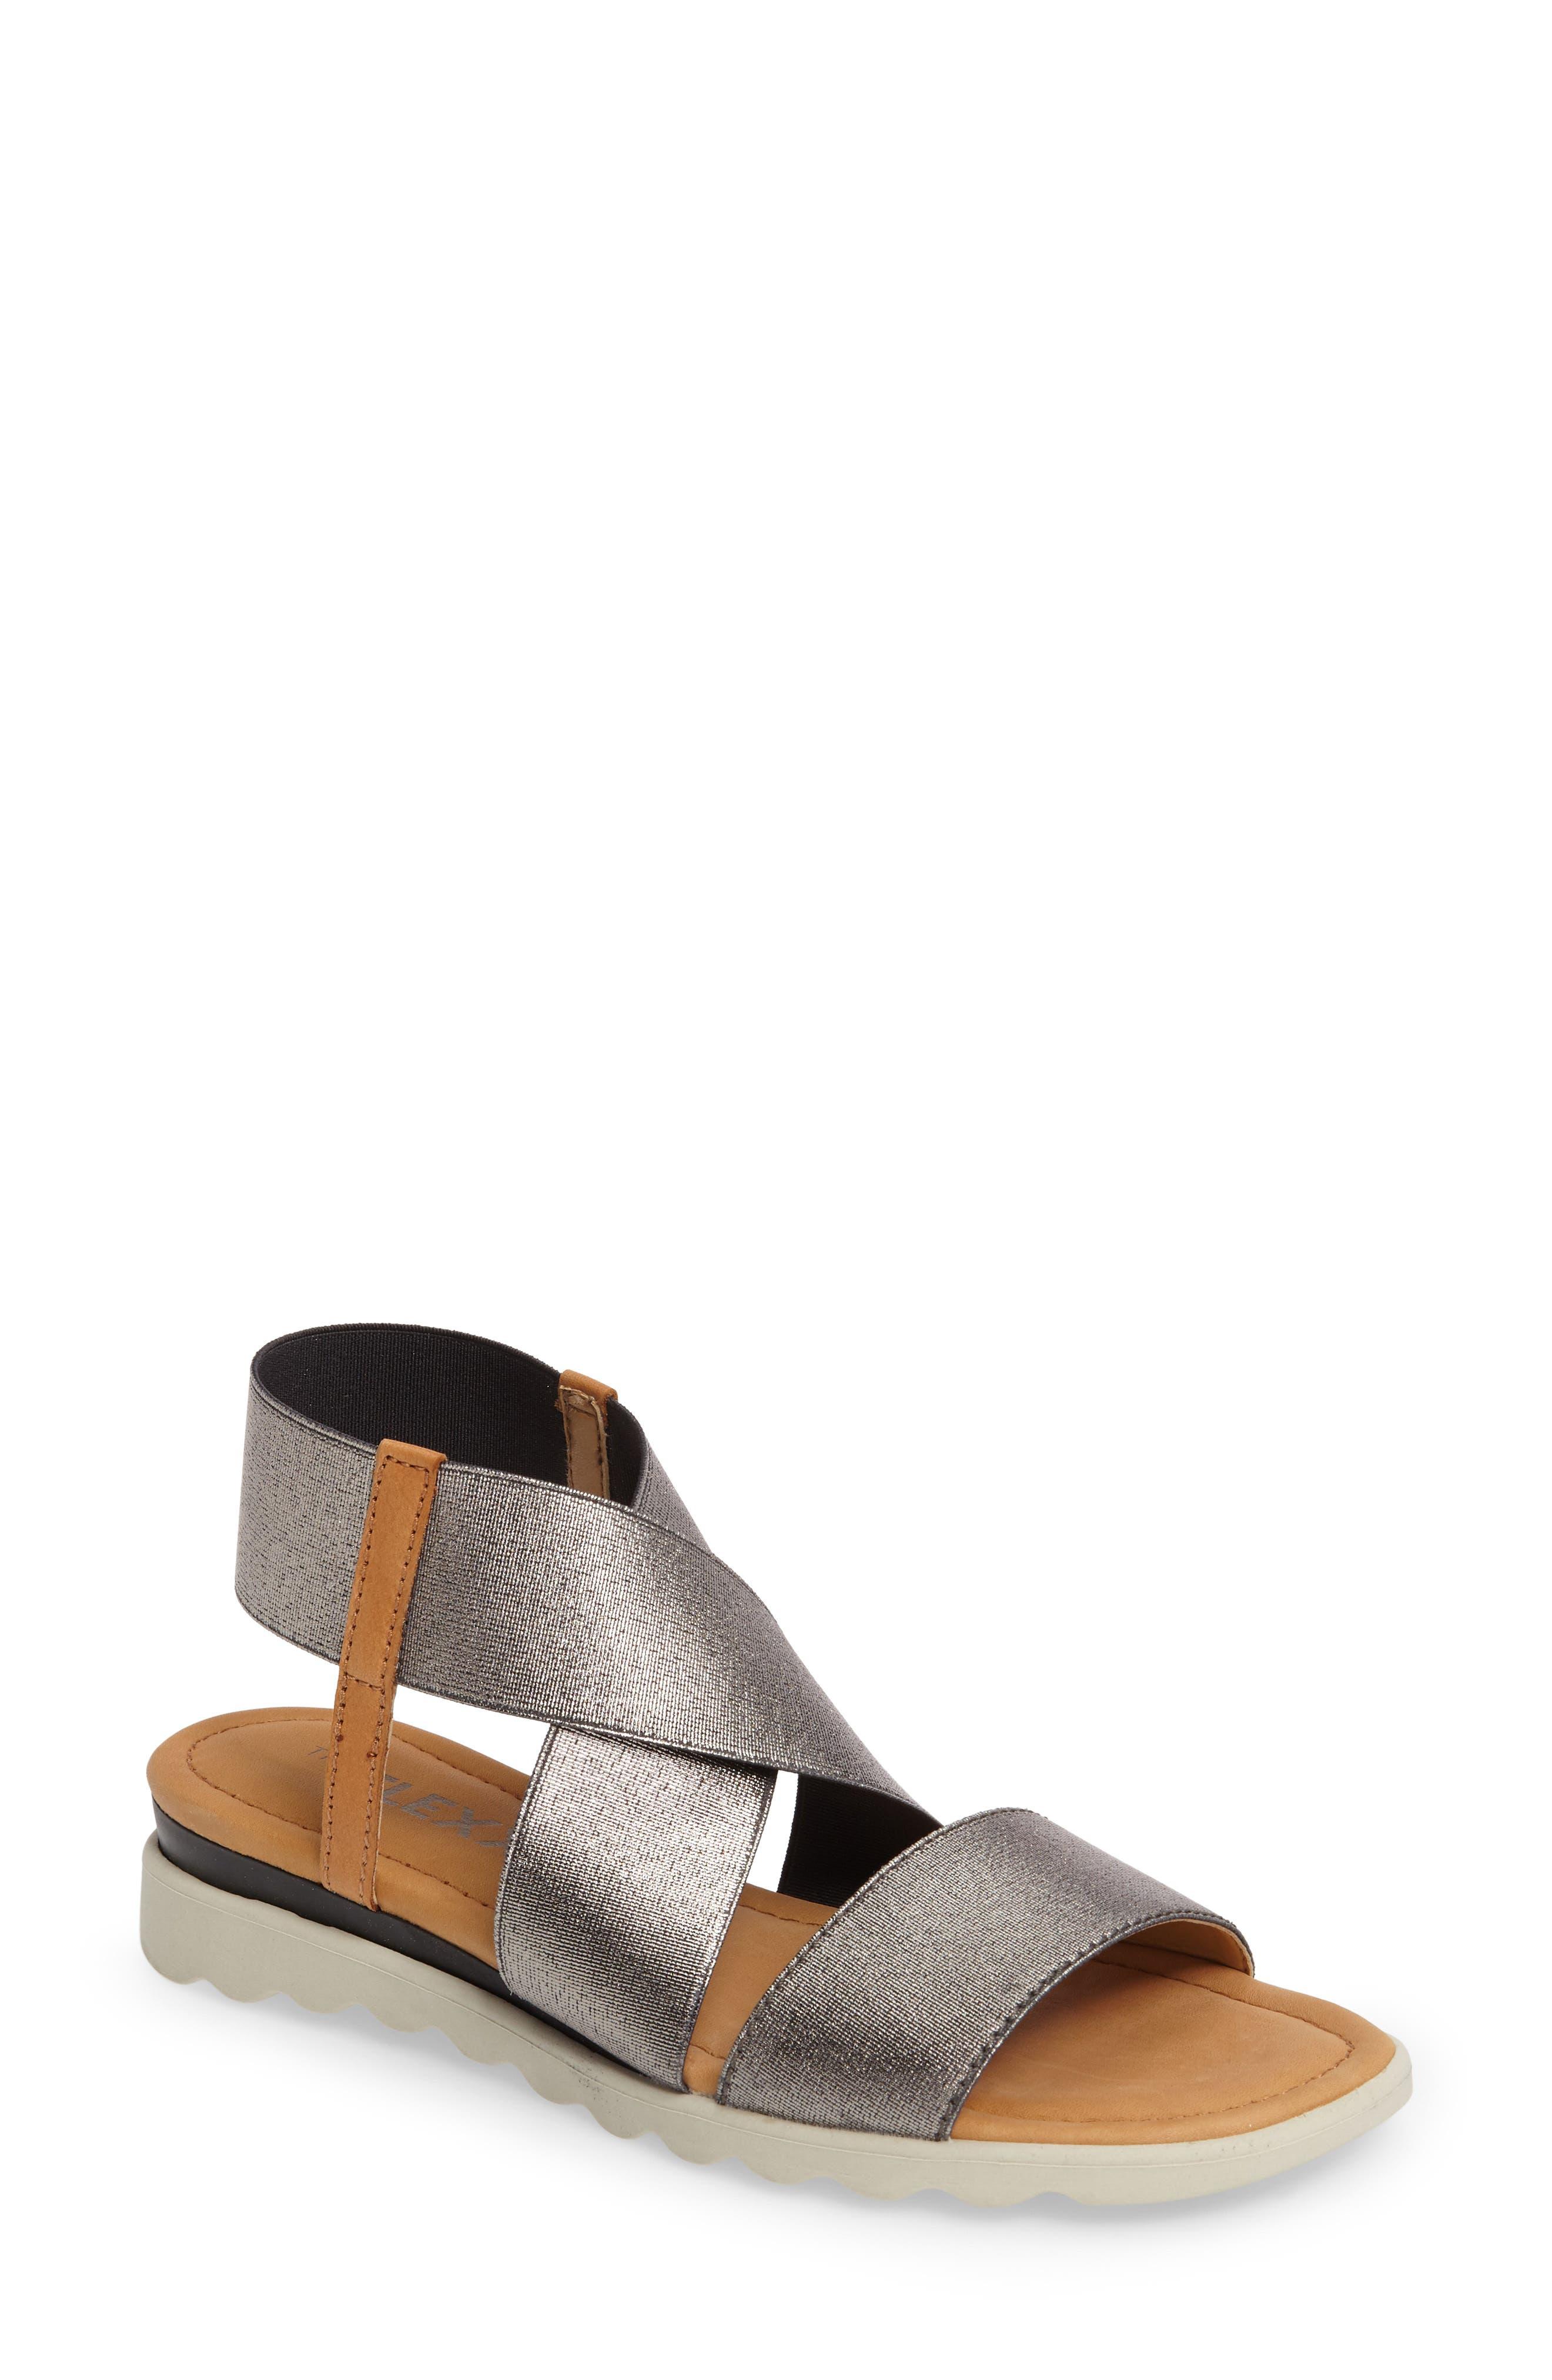 Main Image - The Flexx Extra Sandal (Women)